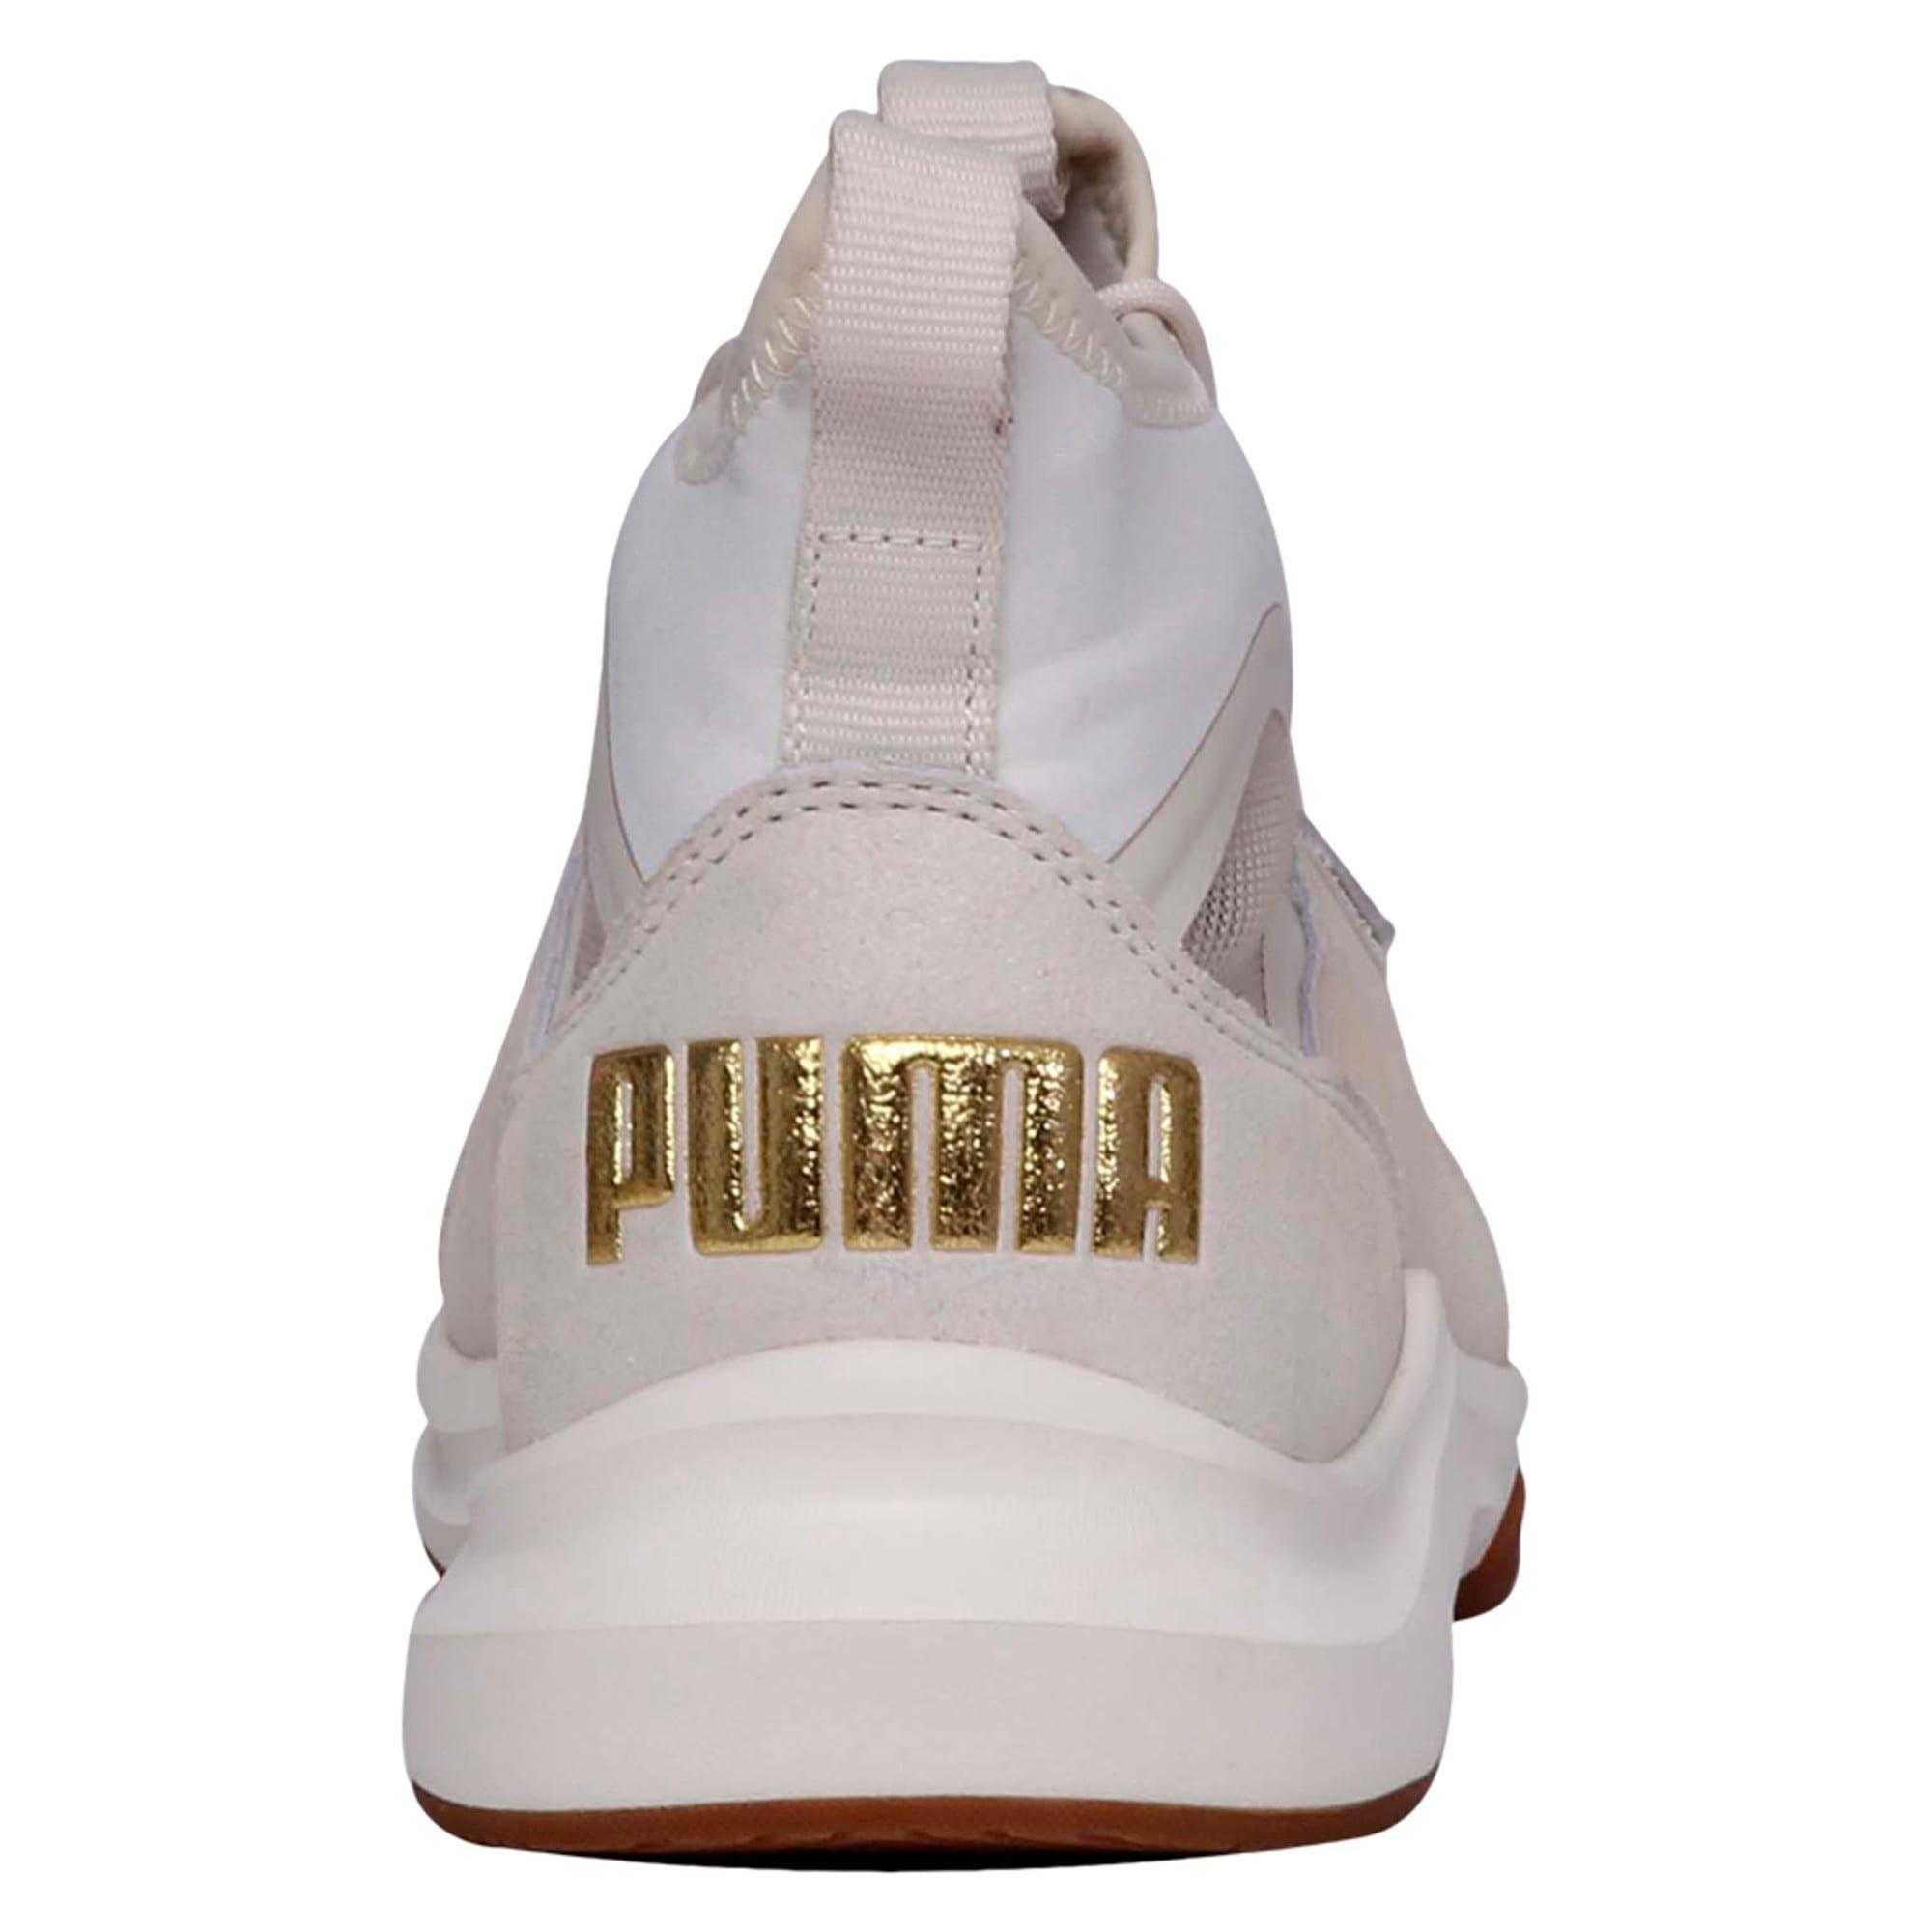 Thumbnail 4 of Phenom Shimmer Women's Training Shoes, Birch-Whisper White, medium-IND